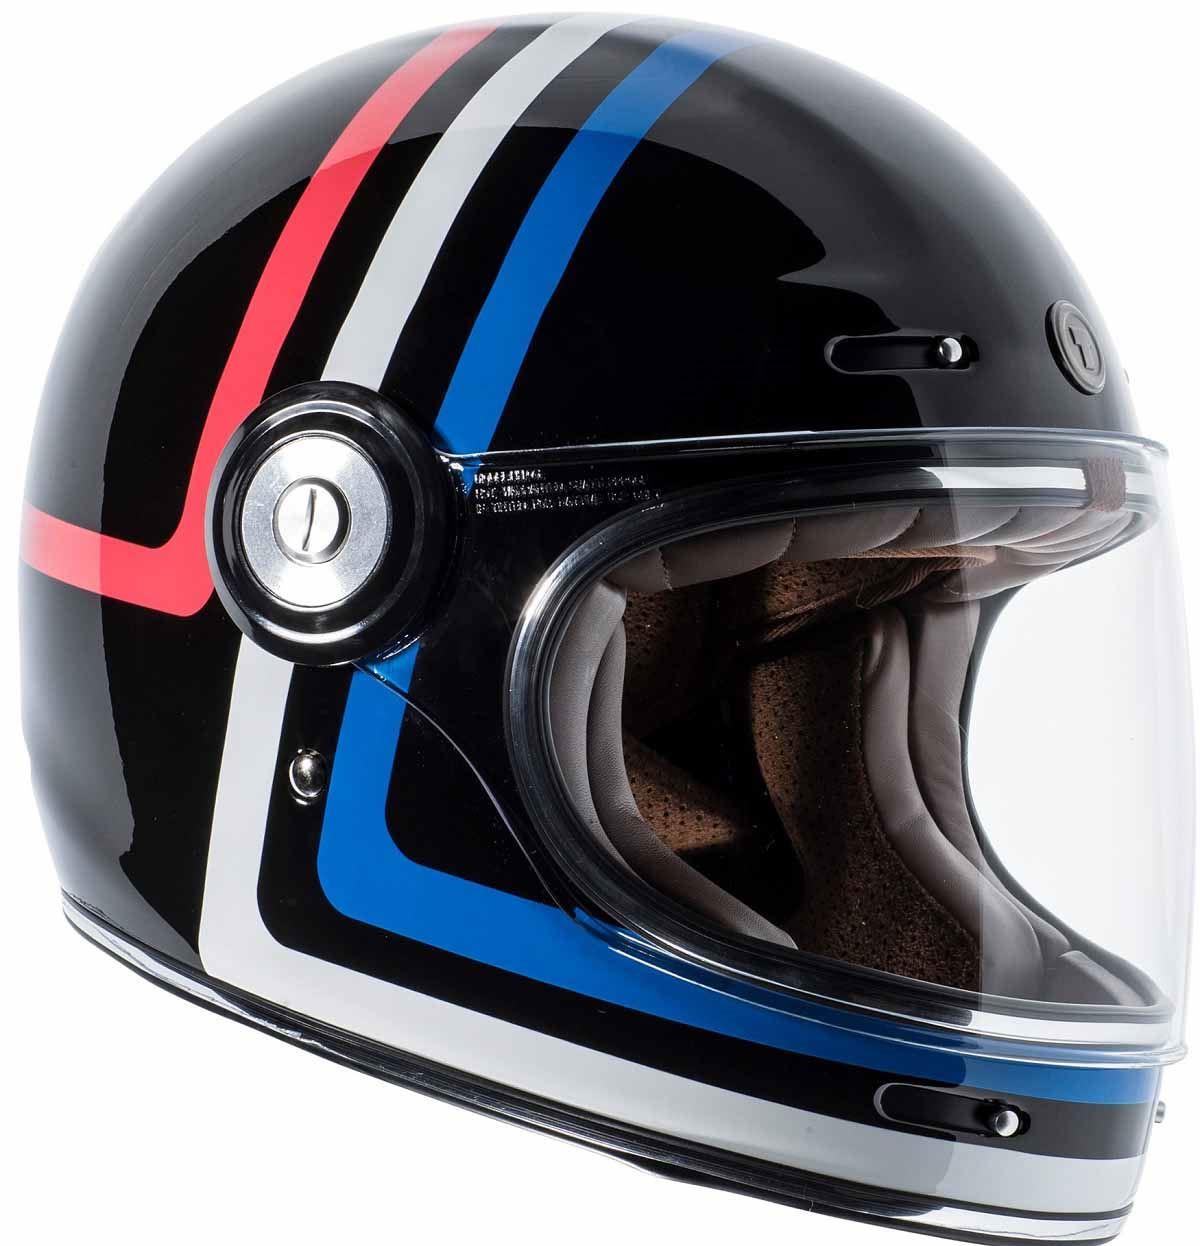 miniature 13 - Torc T1 Helmet Retro Vintage Style Fiberglass DOT Approved XS-2XL